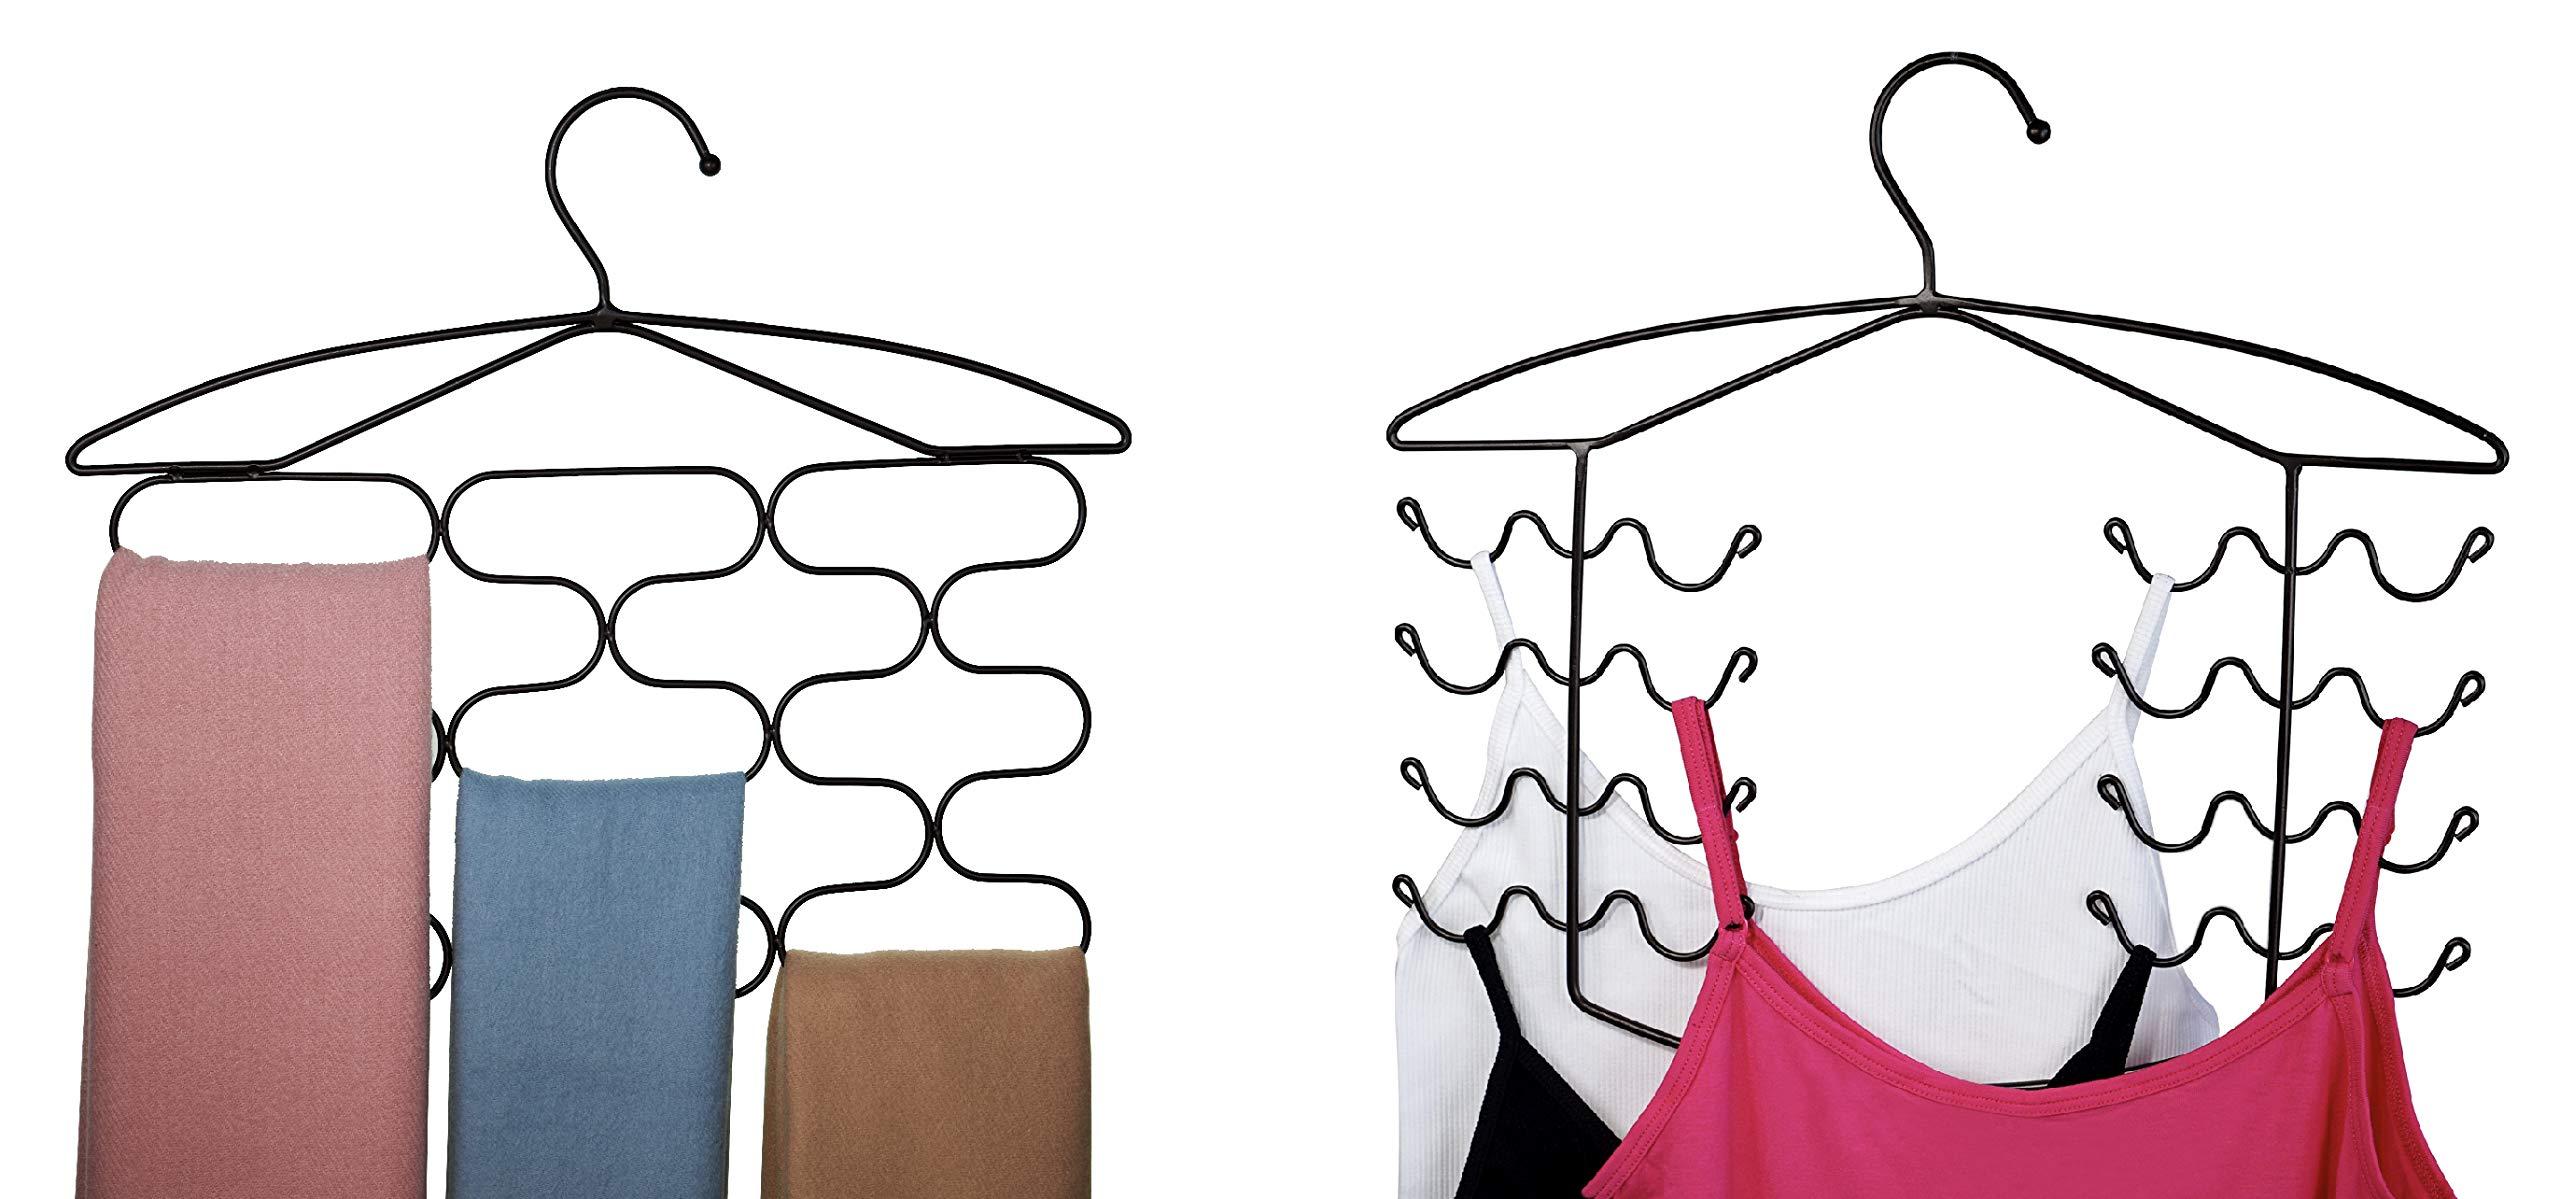 CAXXA Combo Pack Bra Camisole Dress Tank Top Hanger + 13 Sections Scarf Tie Belt Holder | Closet Bedroom Mudroom Organizer Storage Holder, Bronze by CAXXA